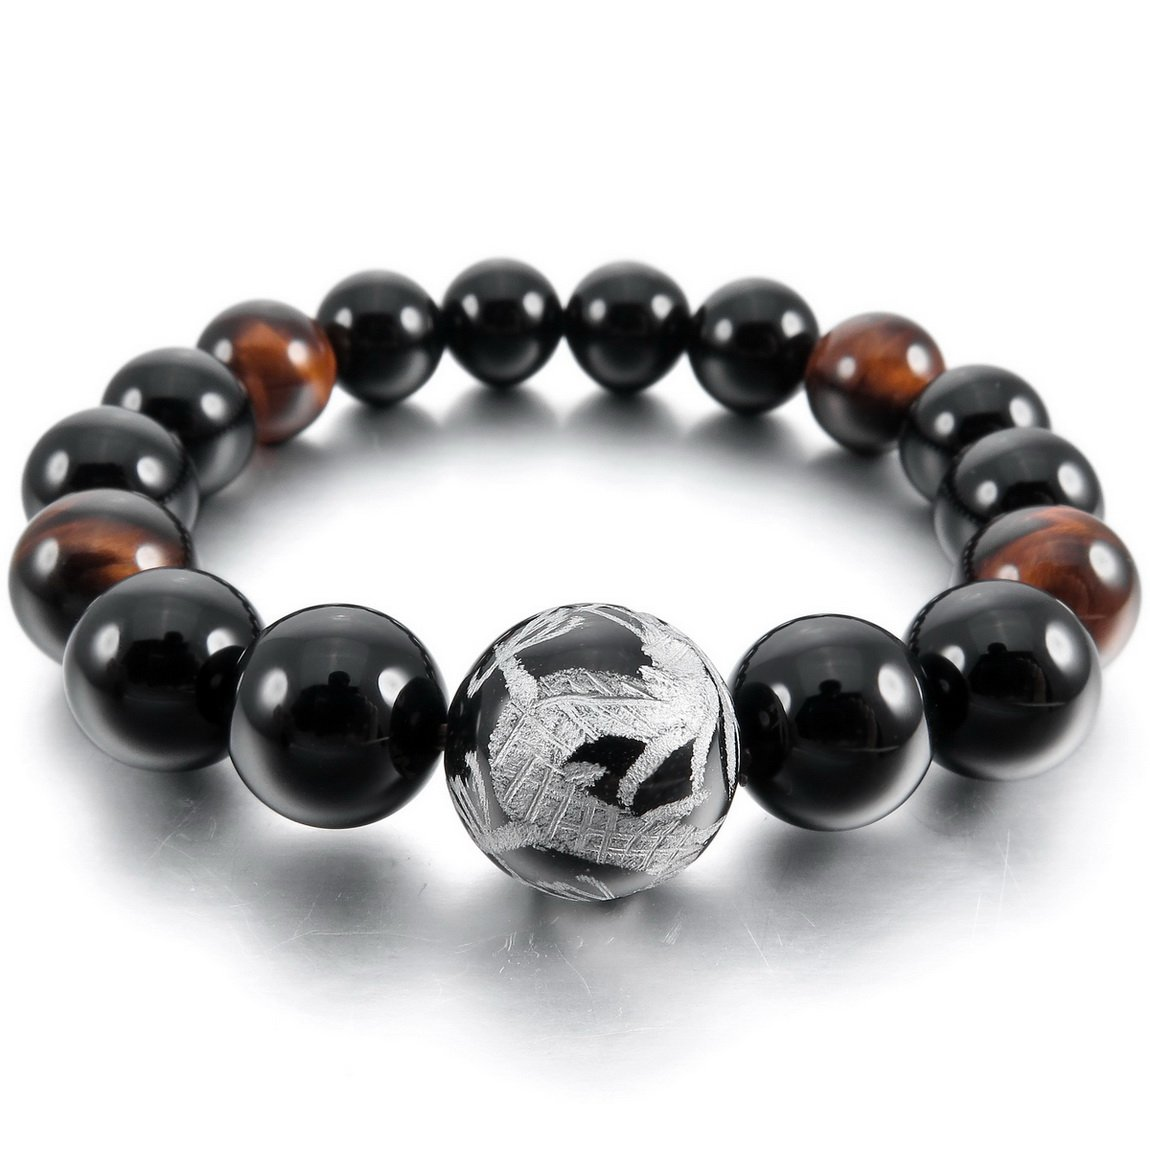 INBLUE Men,Women's 12mm Energy Bracelet Link Wrist Energy Stone Black Silver Tone Dragon Buddha Mala Bead